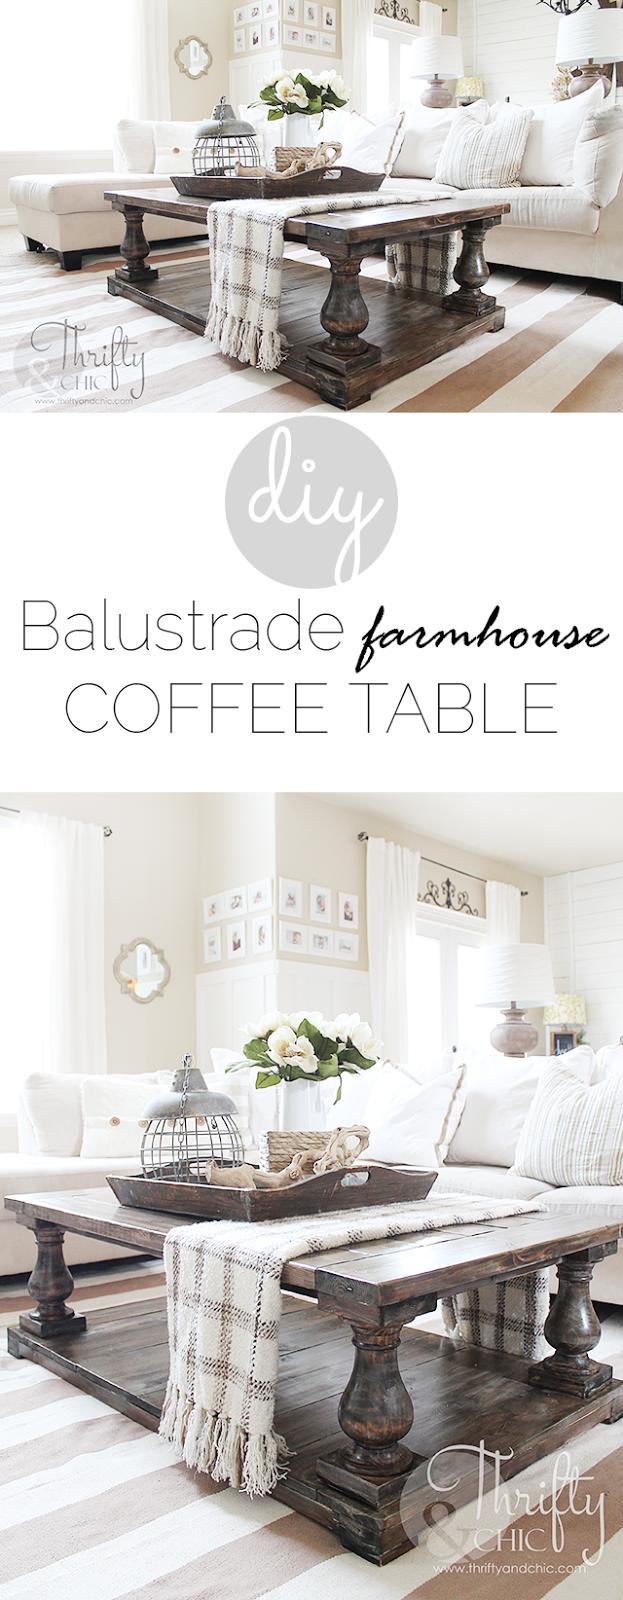 Diy Balustrade Farmhouse Coffee Table Decorating Coffee Tables